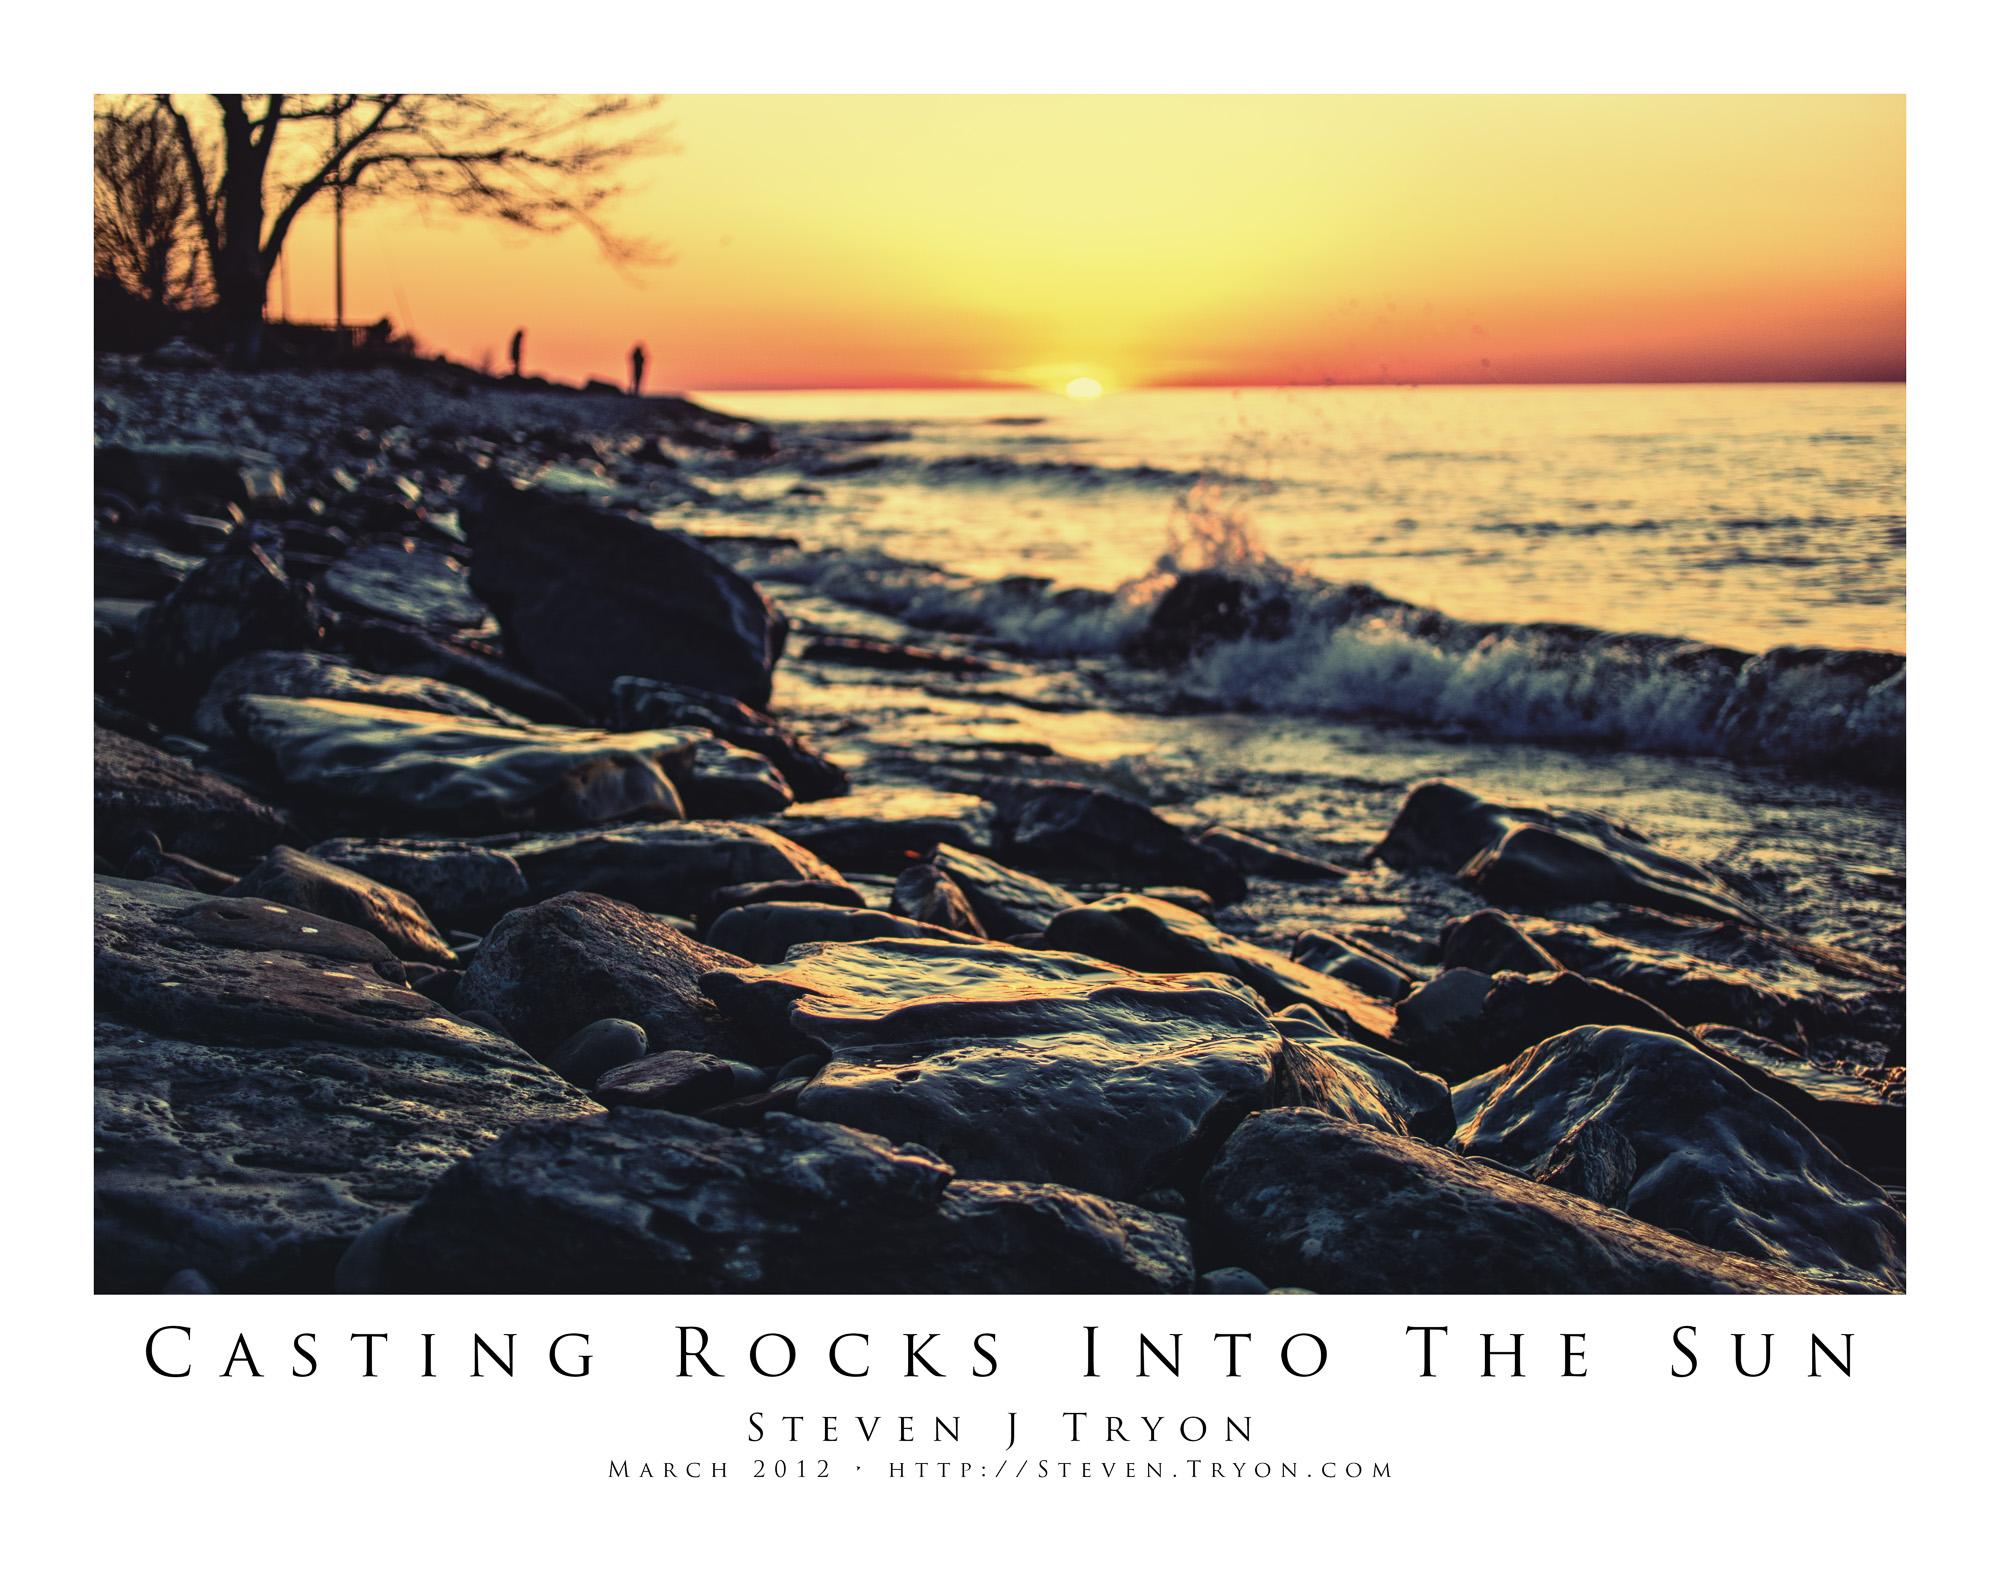 Casting Rocks Into The Sun